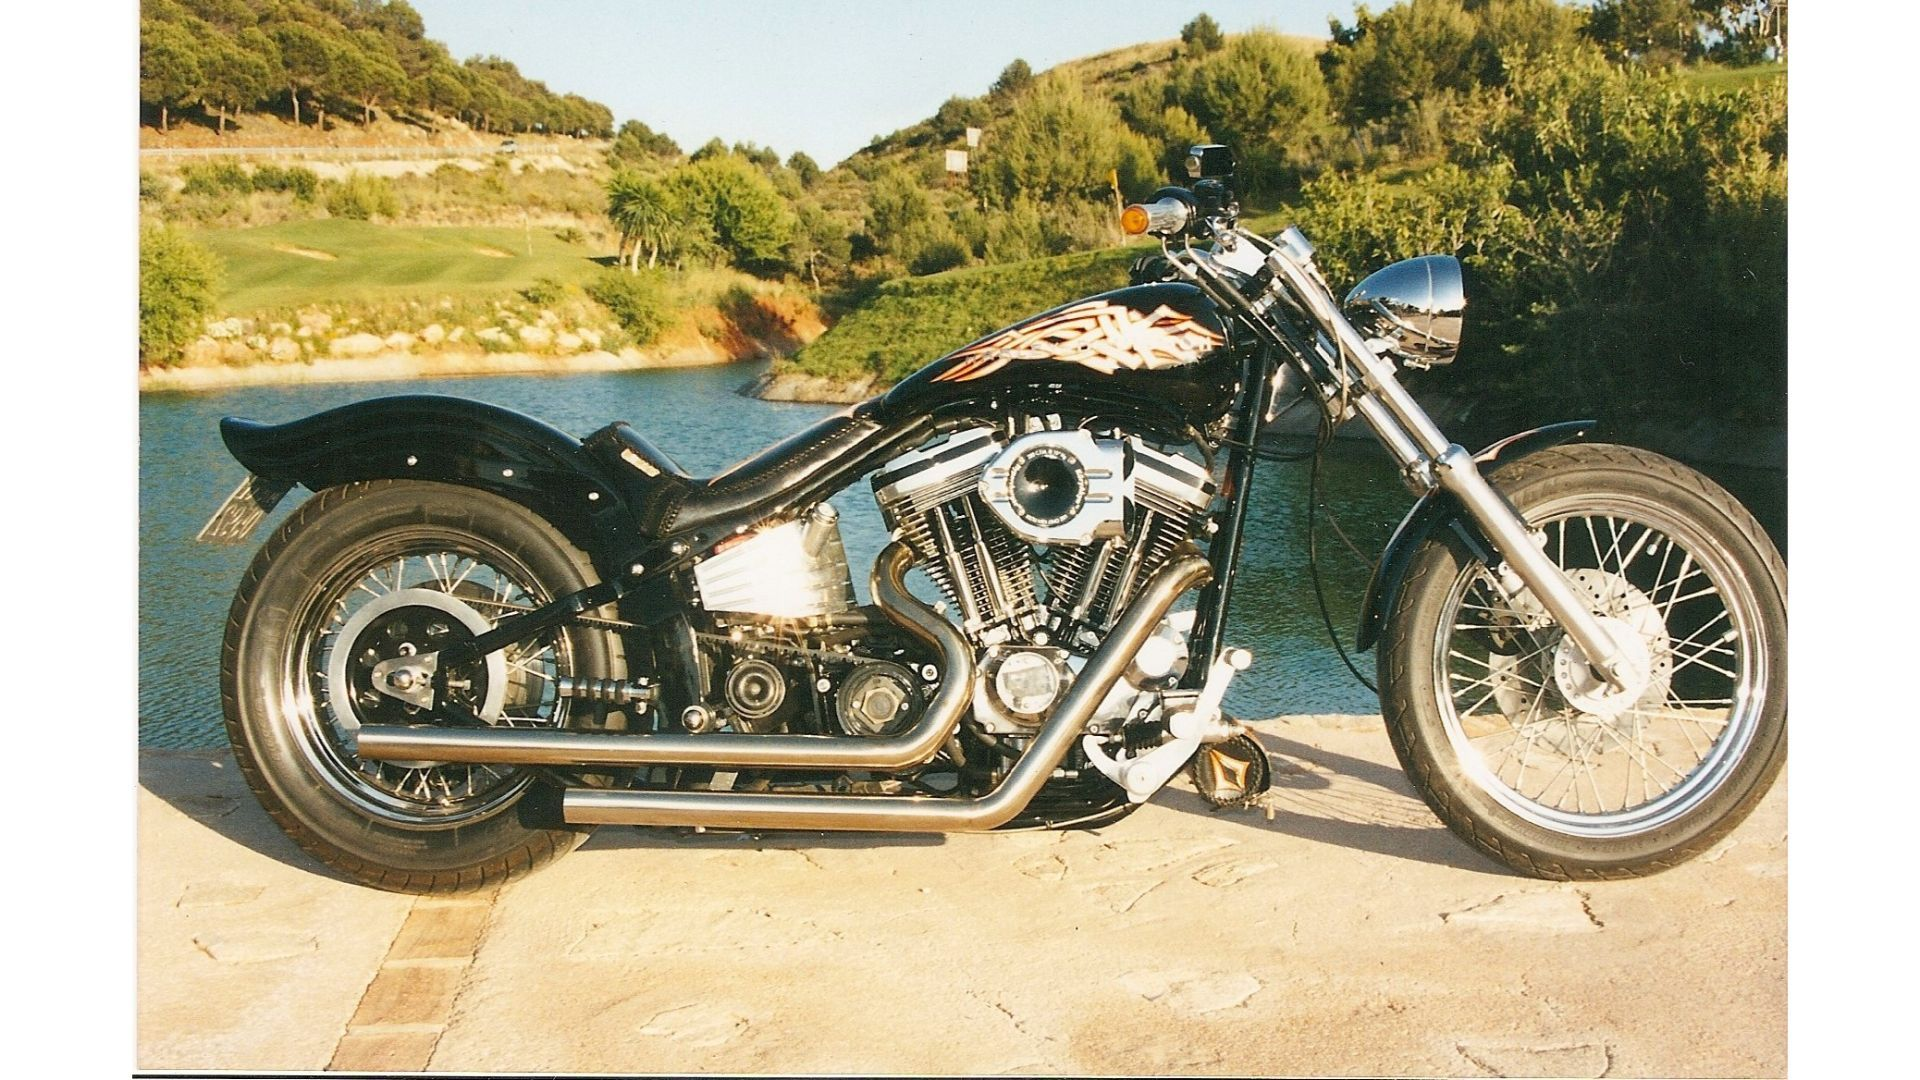 Personalizamos tu moto a medida